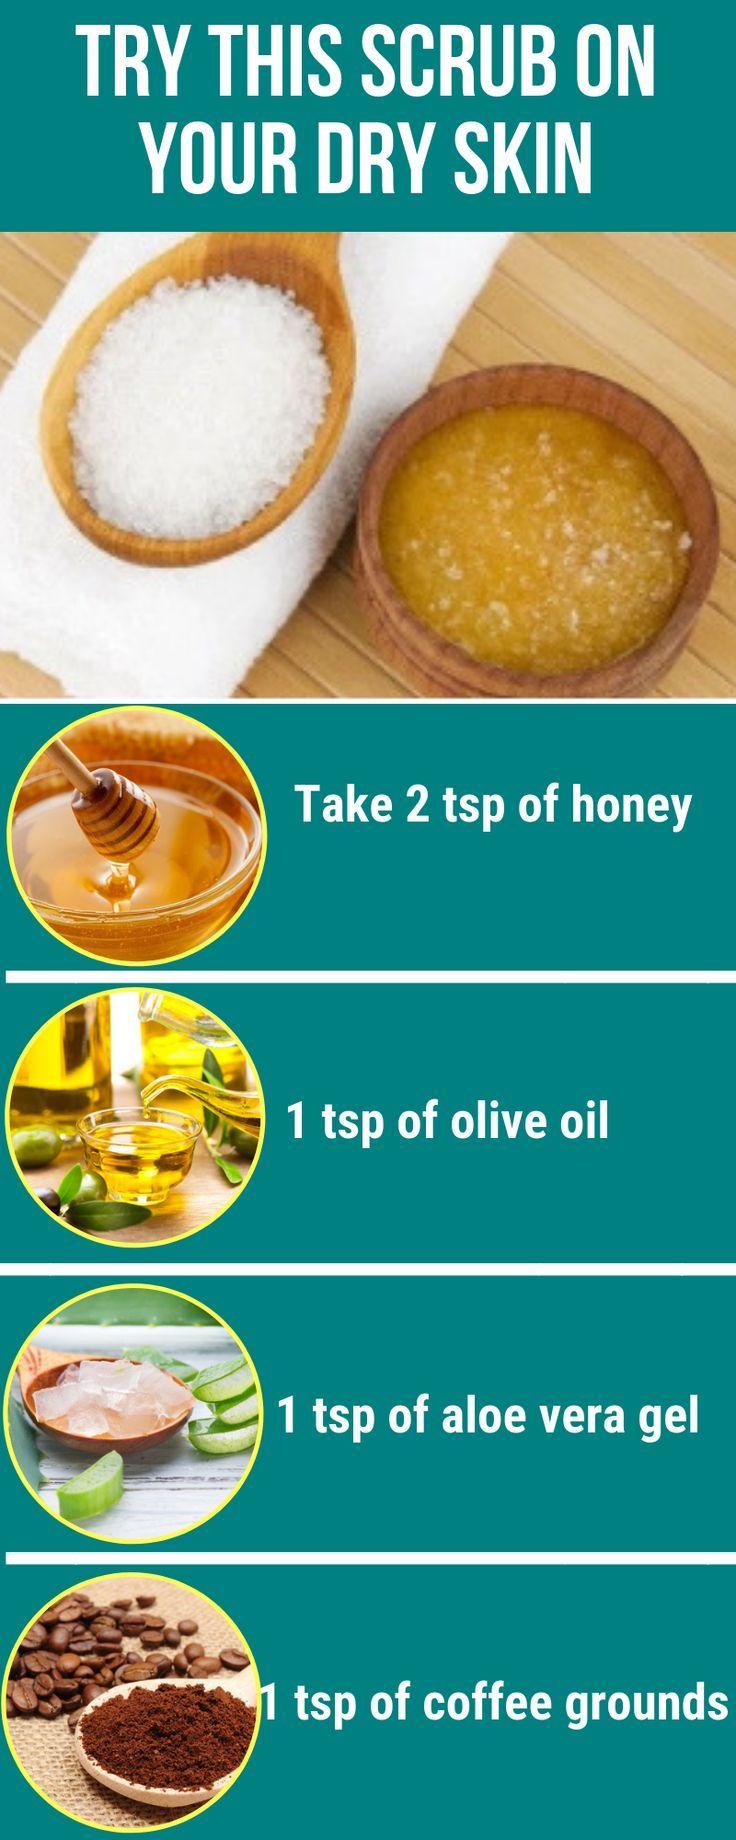 Honig Olivenol Peeling Fur Trockene Oder Empfindliche Haut Skin Scrub Dry Sensitive Skin Oil Scrub